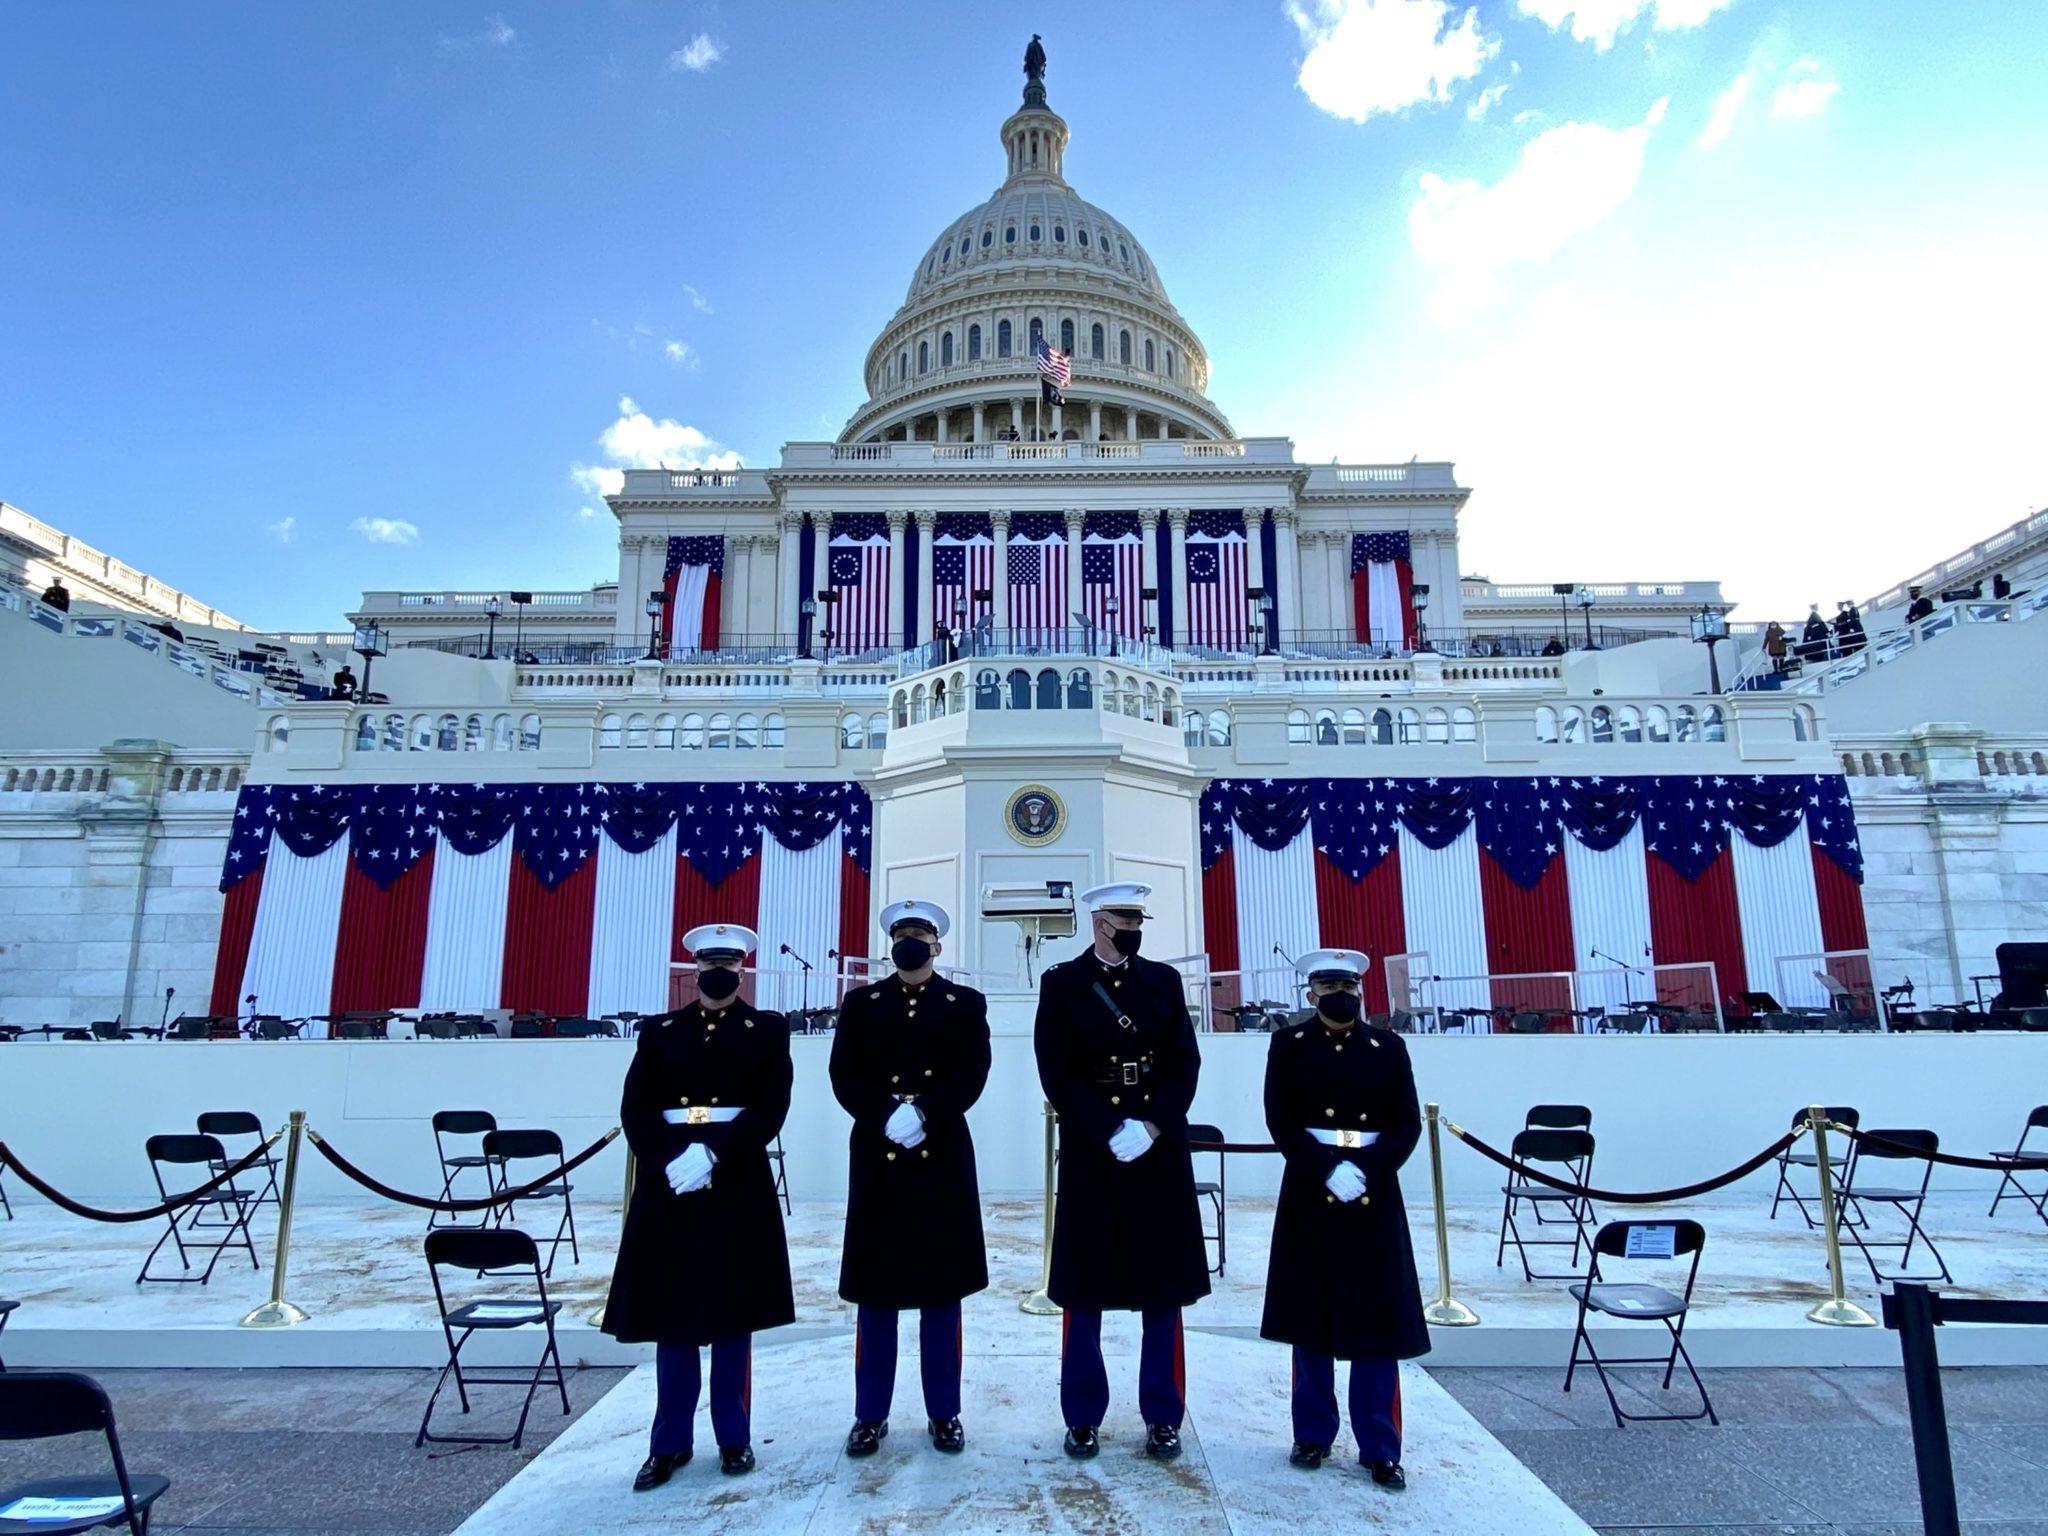 PHOTOS: Scenes From Joe Biden and Kamala Harris's Inauguration